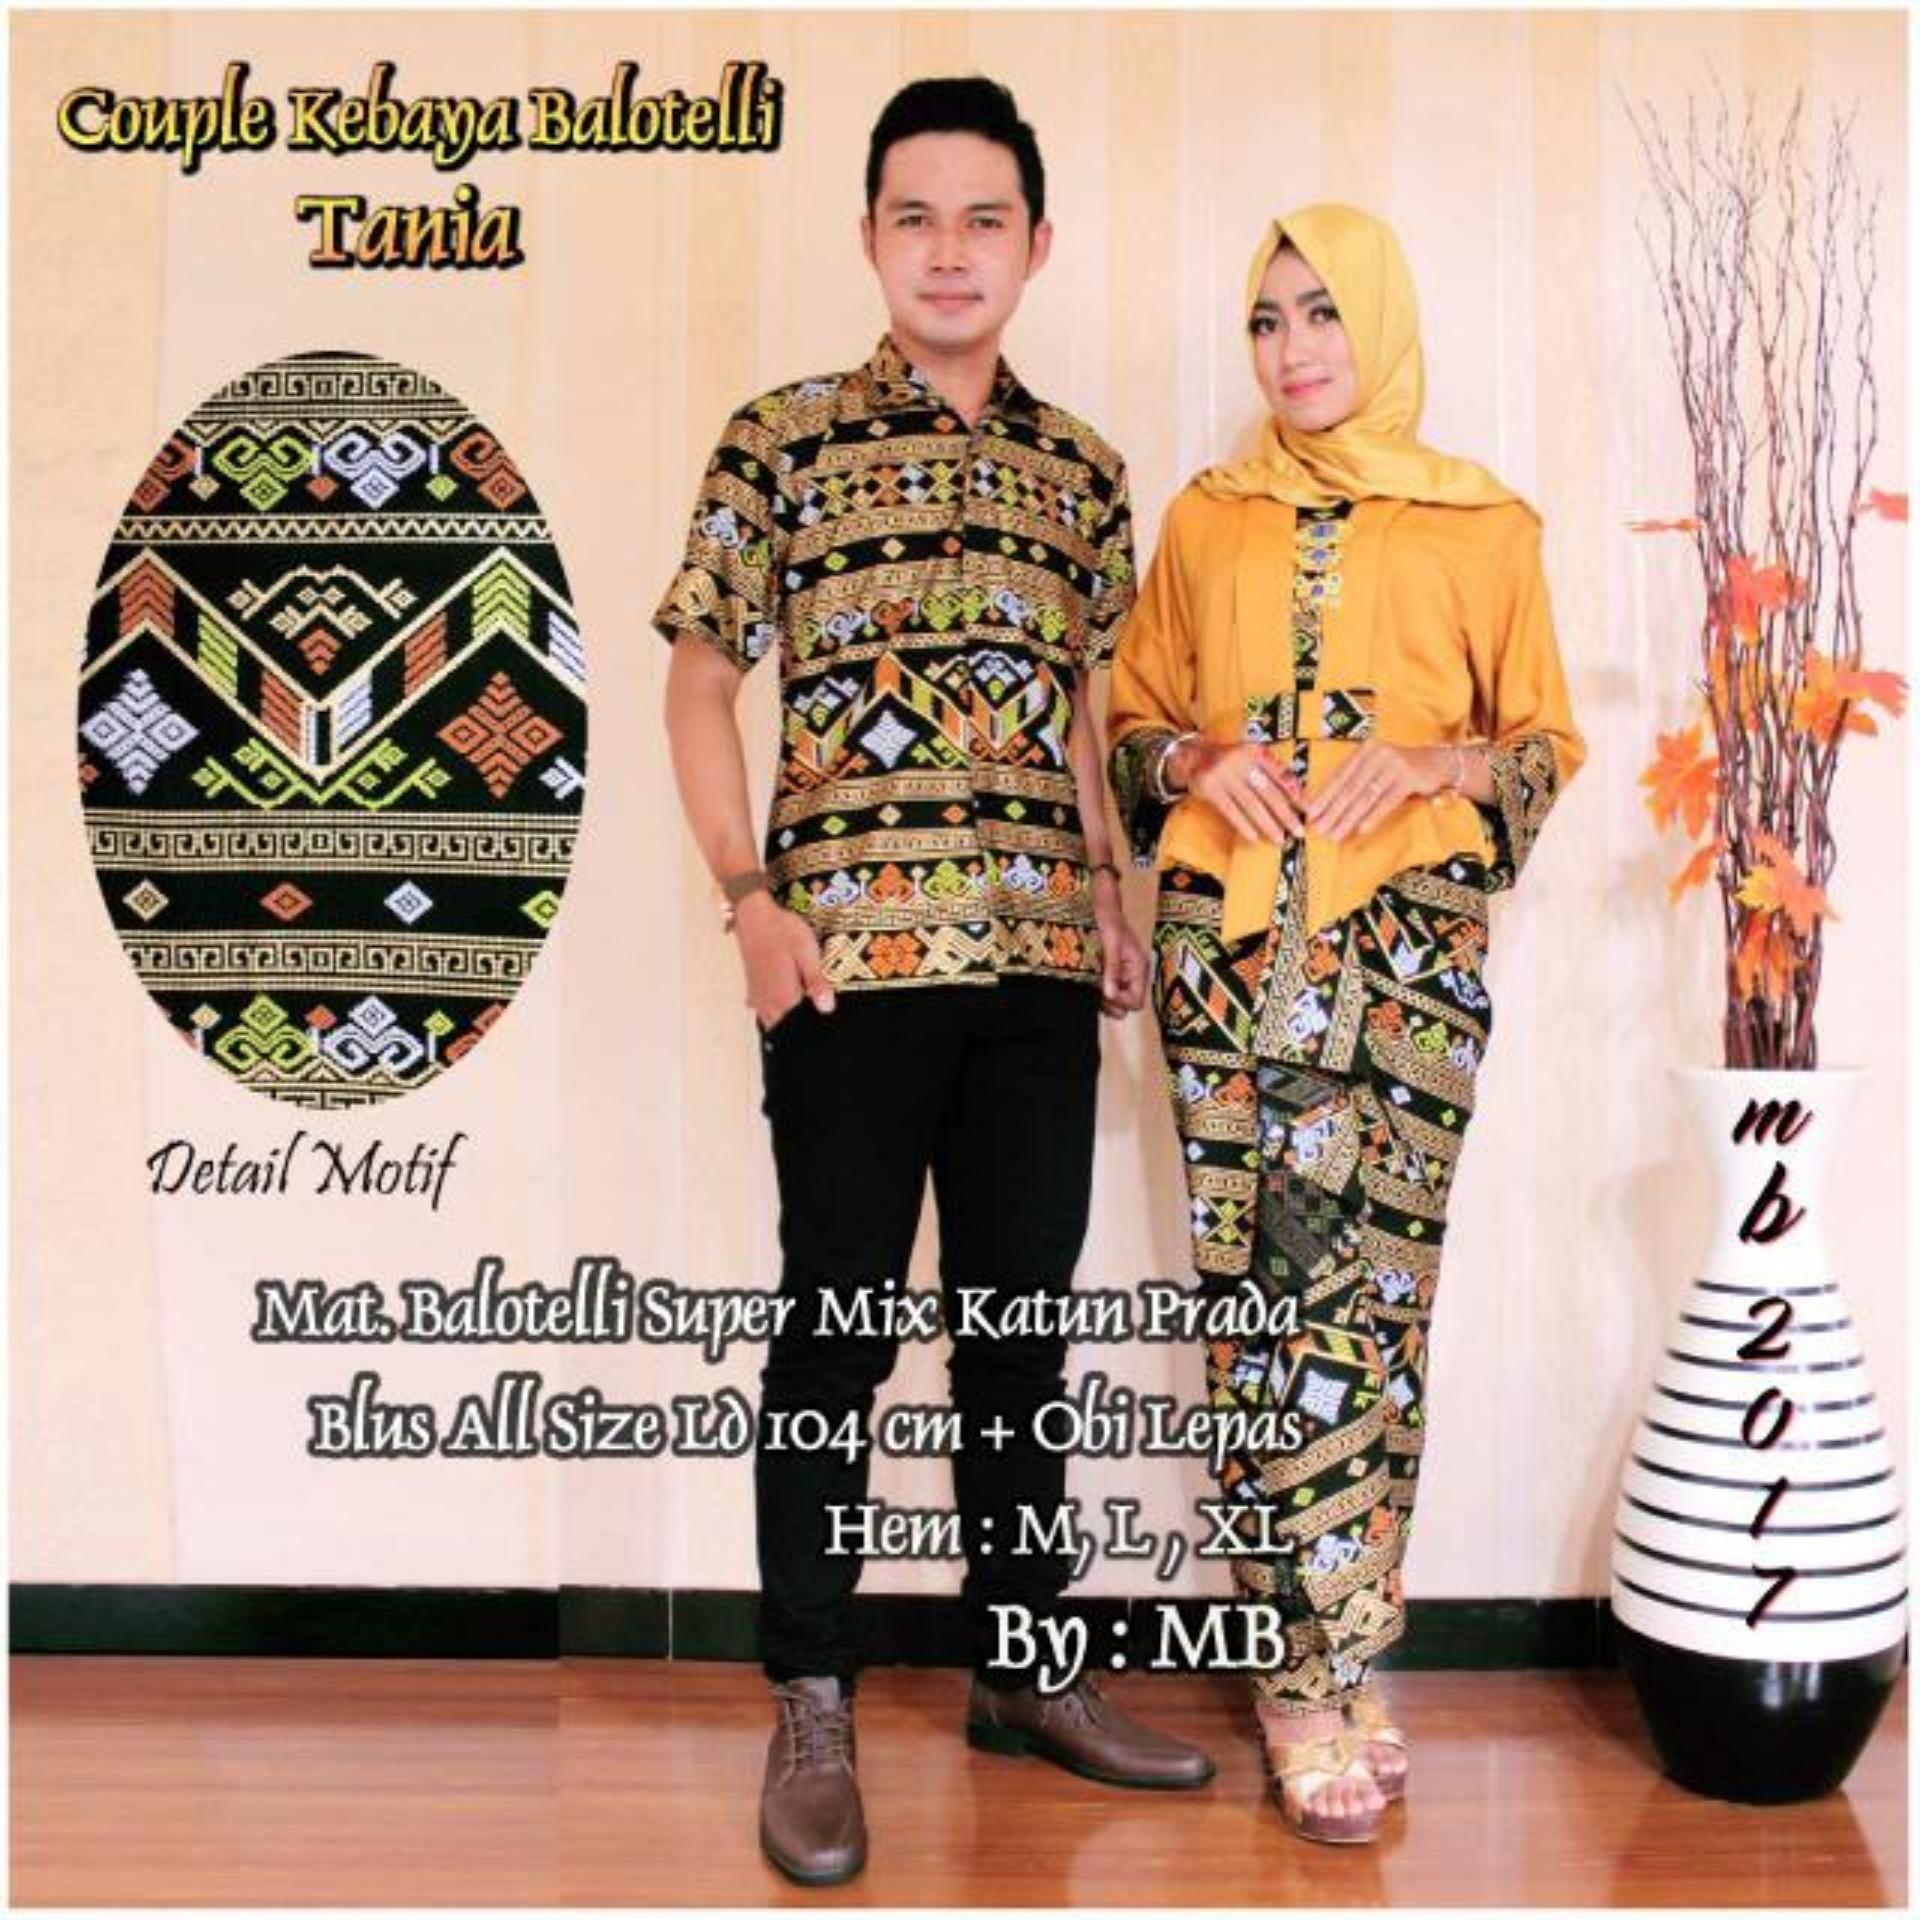 Harga Penawaran Couple Kebaya Balotelli Tania Kuning Baru Solo My Dress Prada Biru Cheap Online